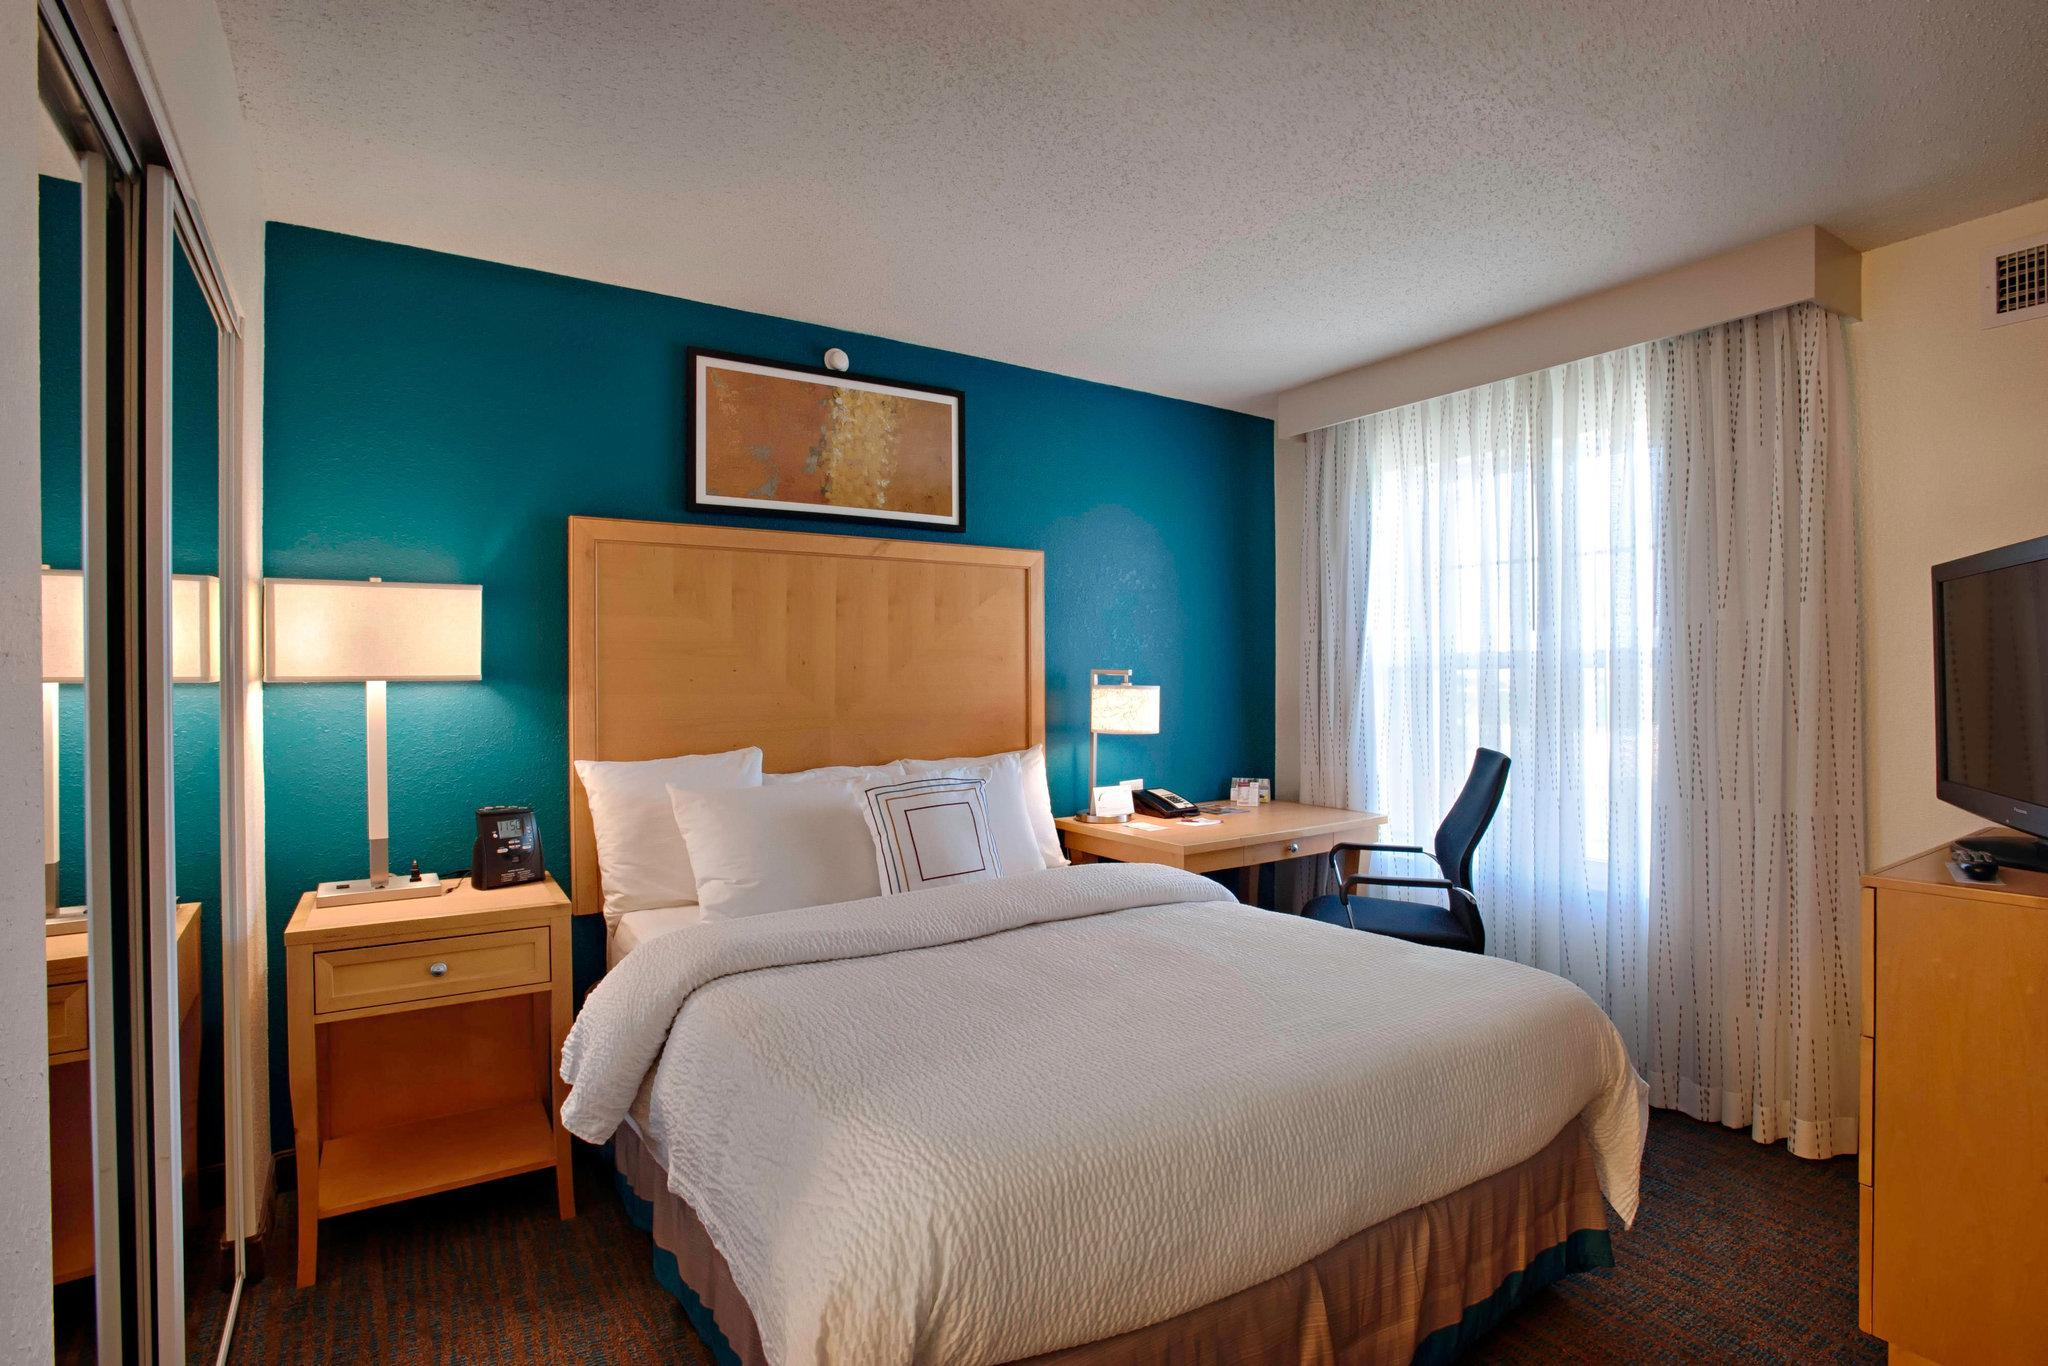 1 Bedroom 2 room Suite, 1 King, Sofa bed